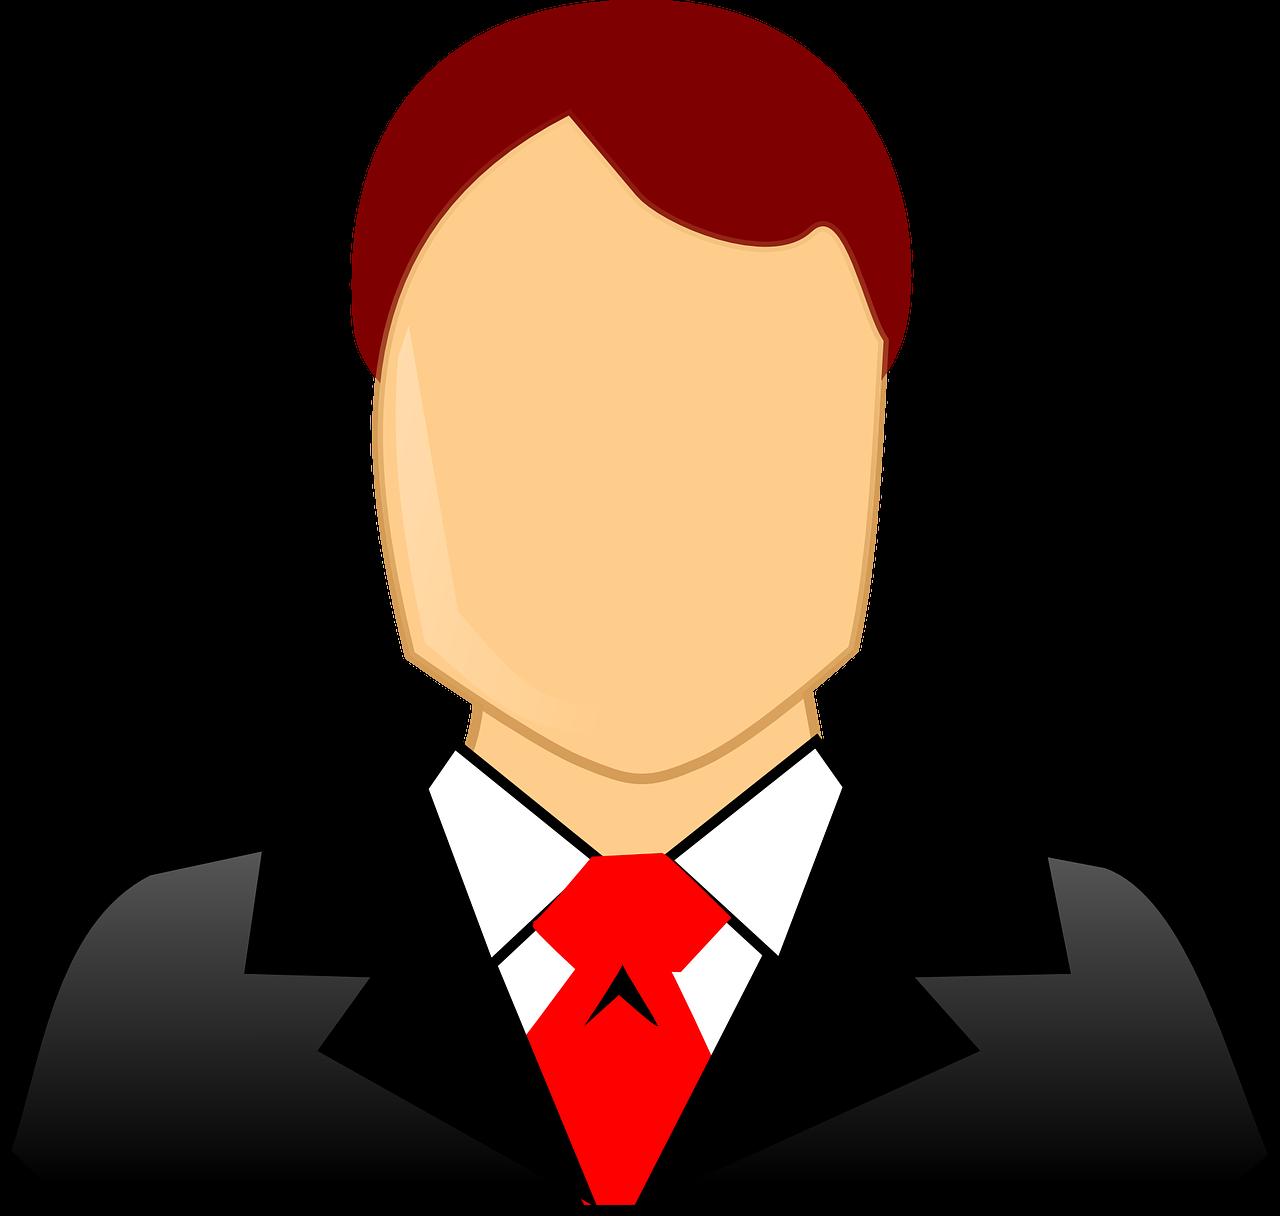 businessman-310819_1280-1280x1216.png